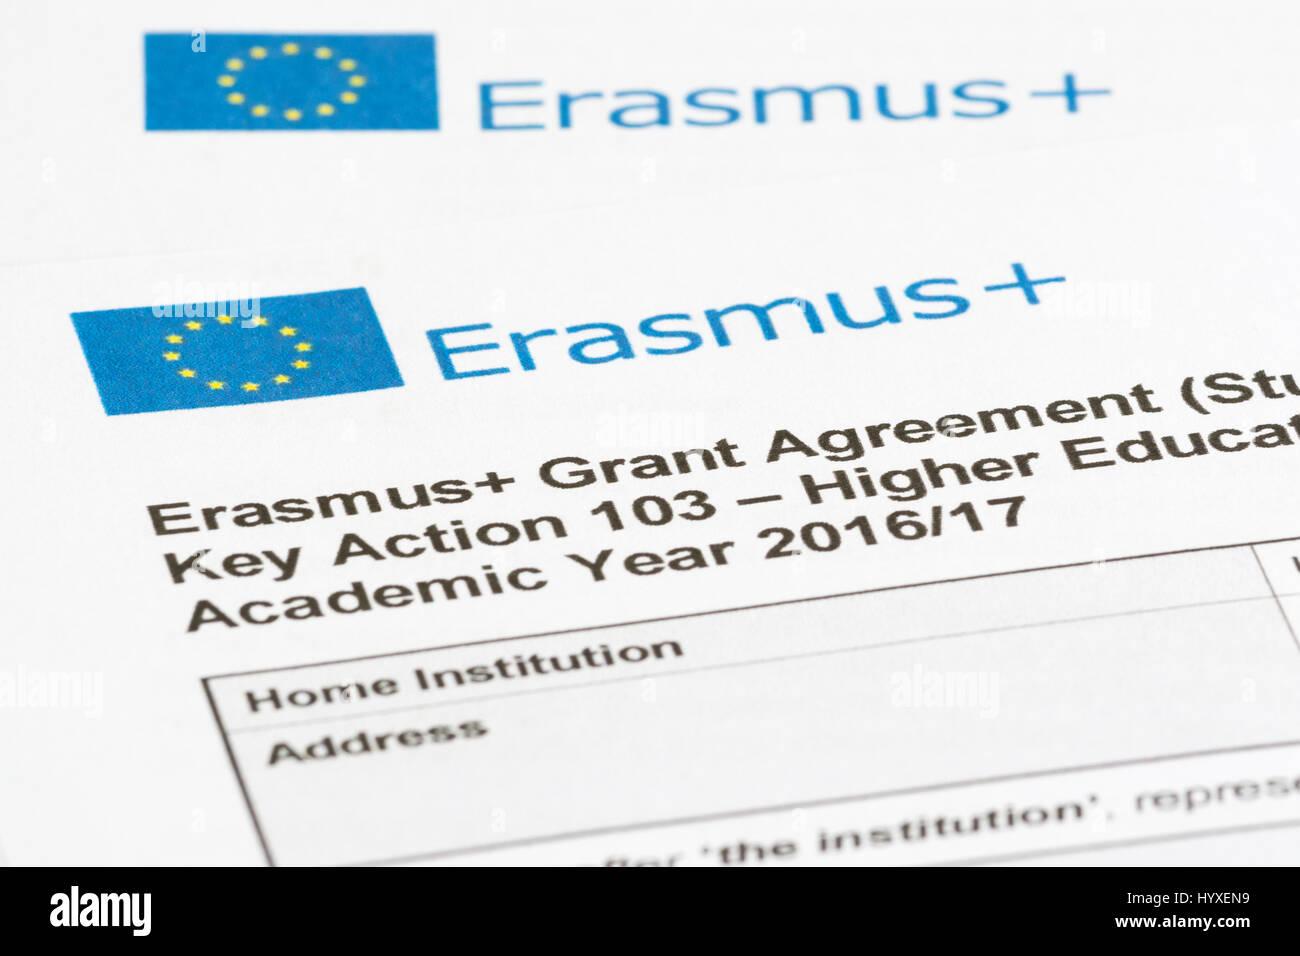 Erasmus+ EU student exchange programme Grant Agreement - Stock Image